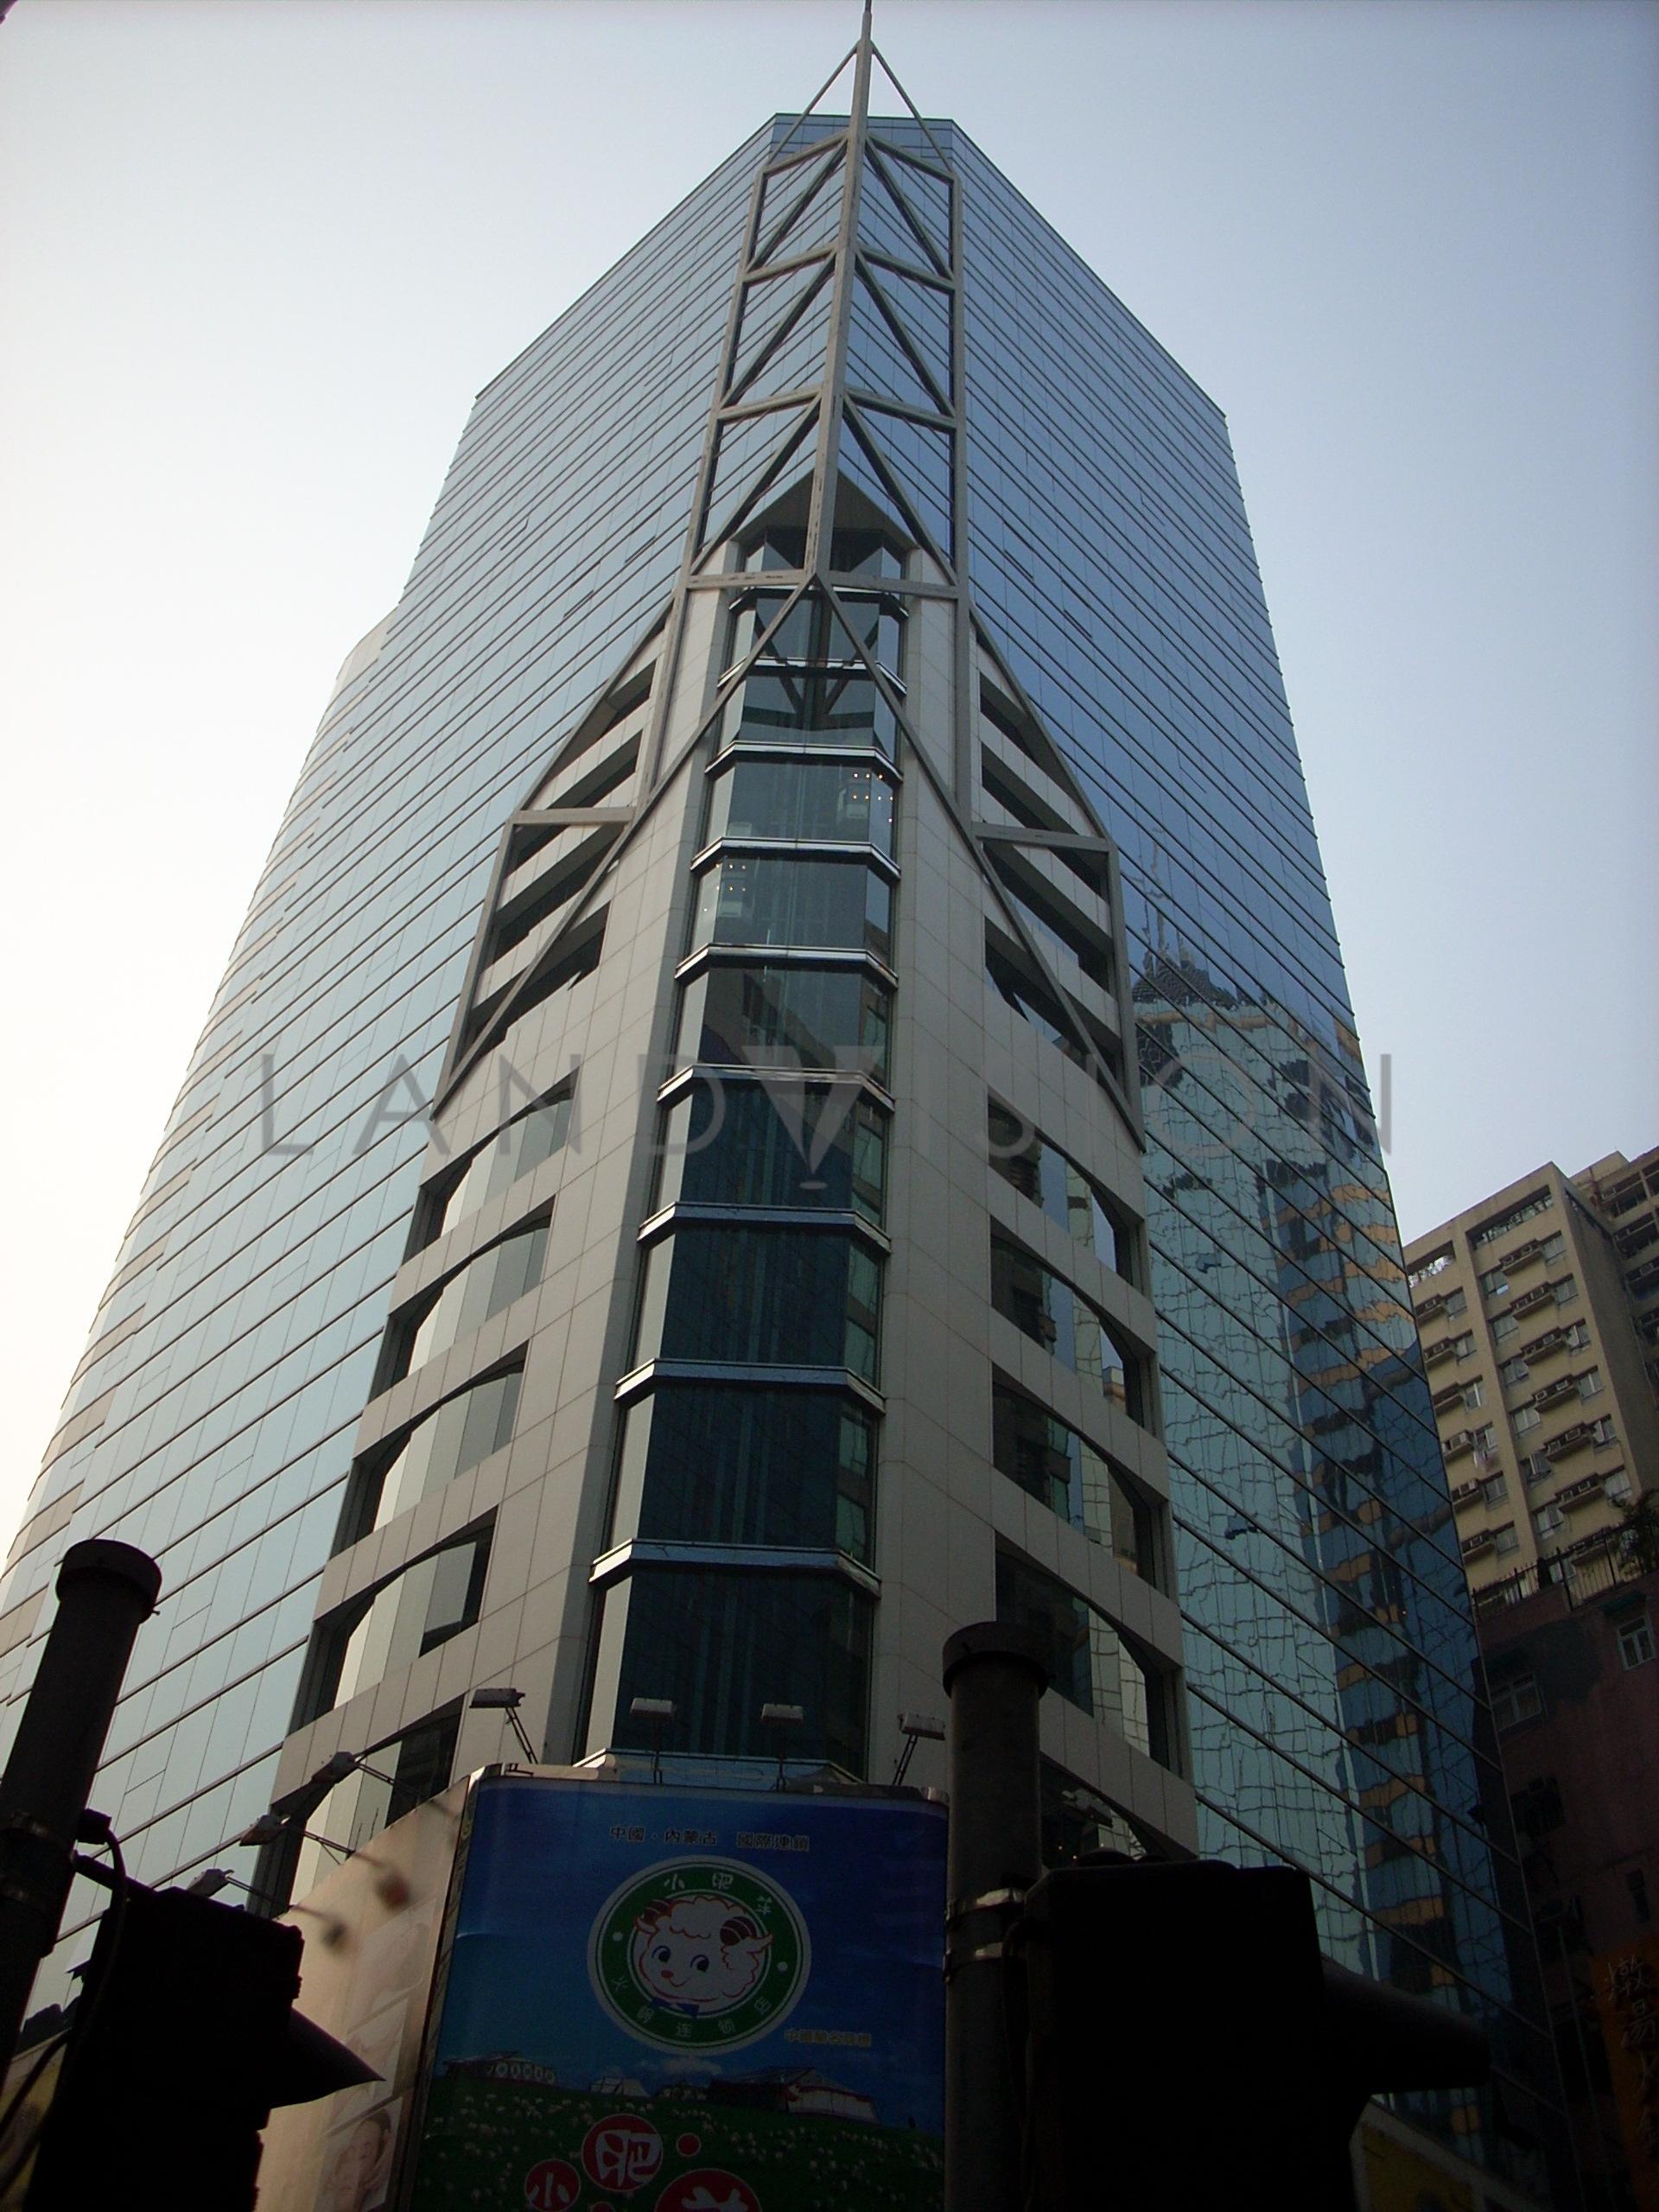 Causeway Bay Plaza 2,463-483 Lockhart Road, Causeway Bay, Hong Kong